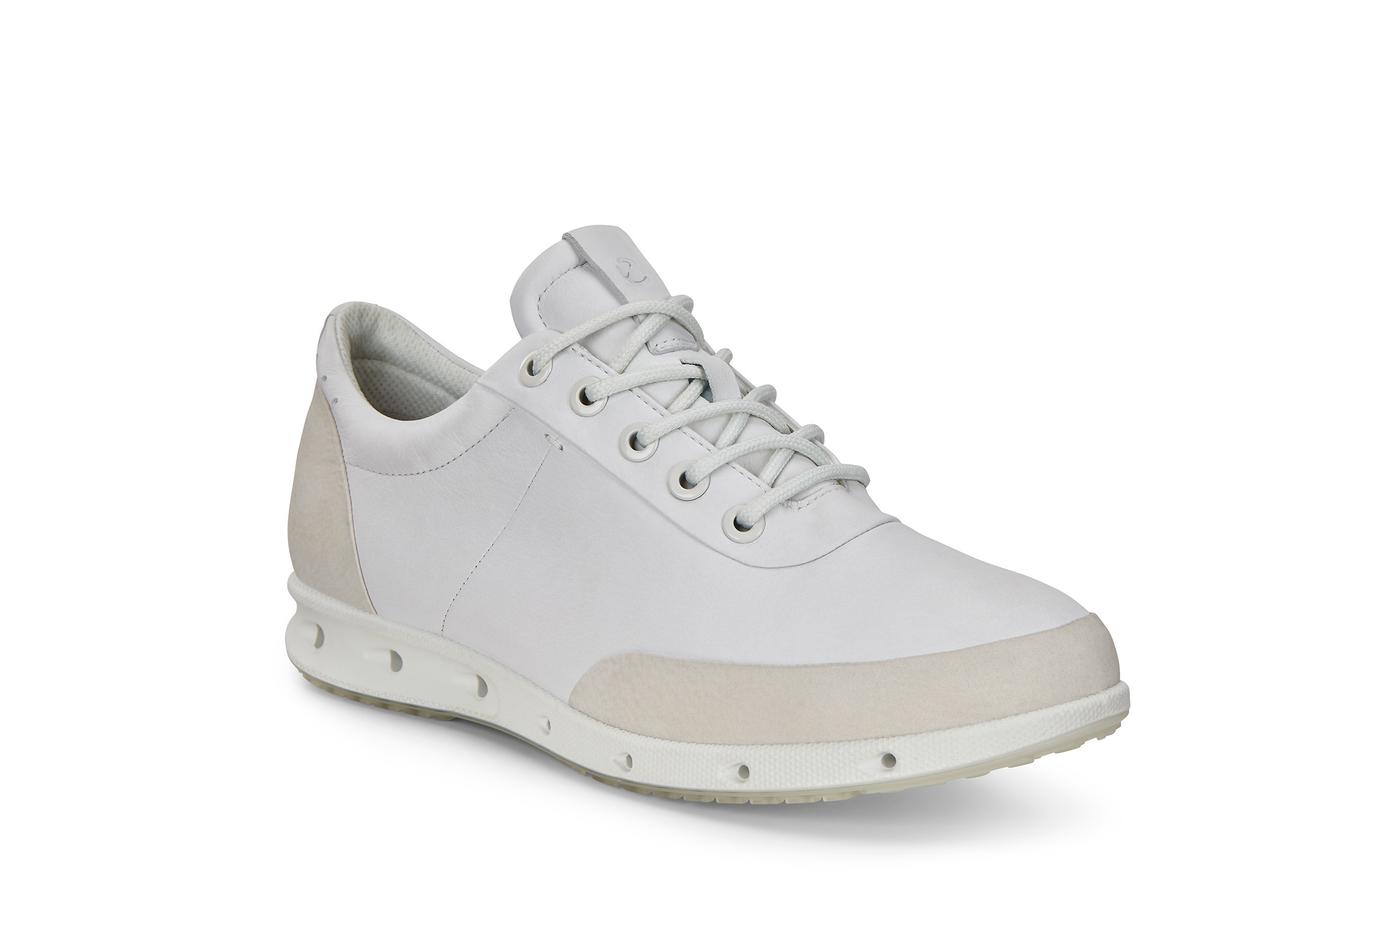 ECCO COOL Womens Nuback Sneaker GTX